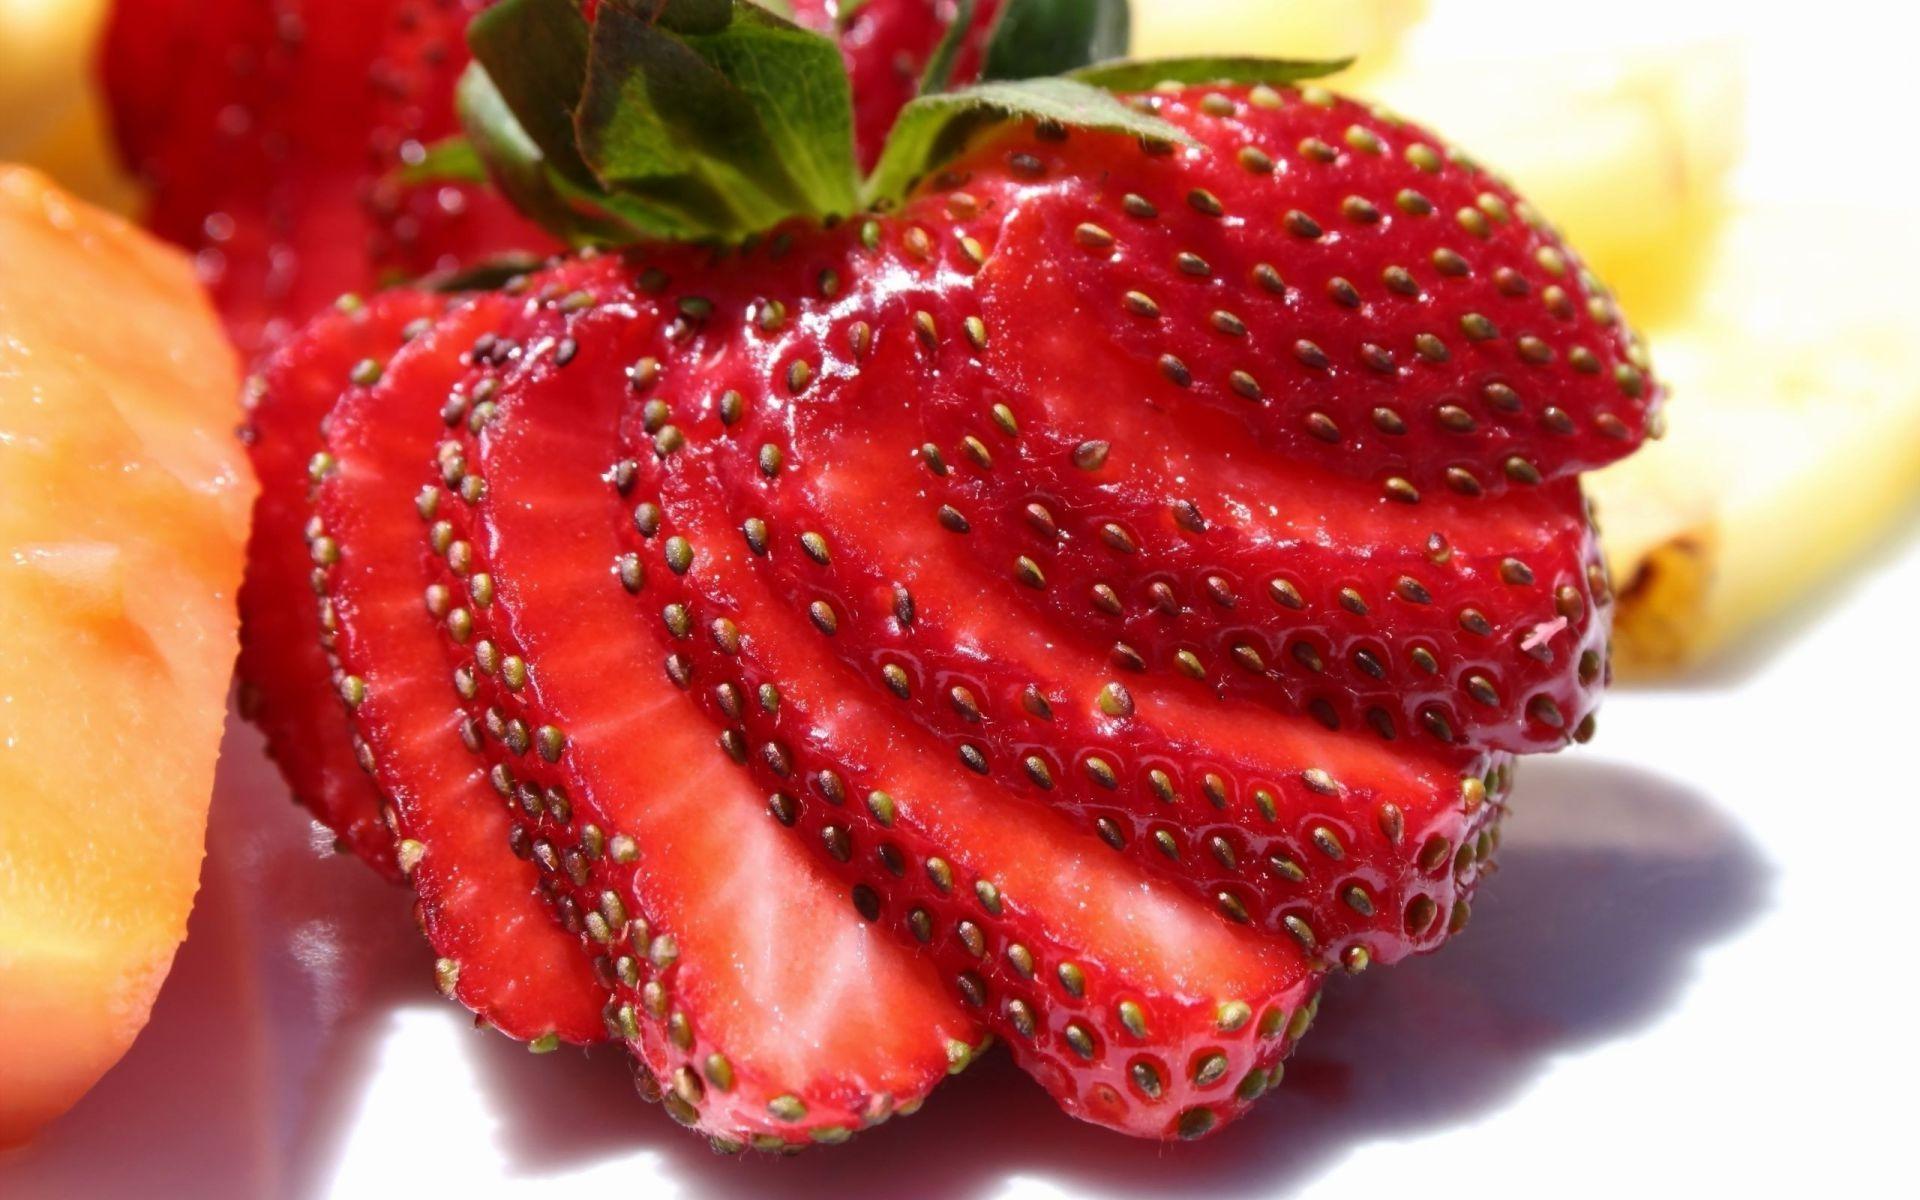 Обои ягода, клубника. Еда foto 19